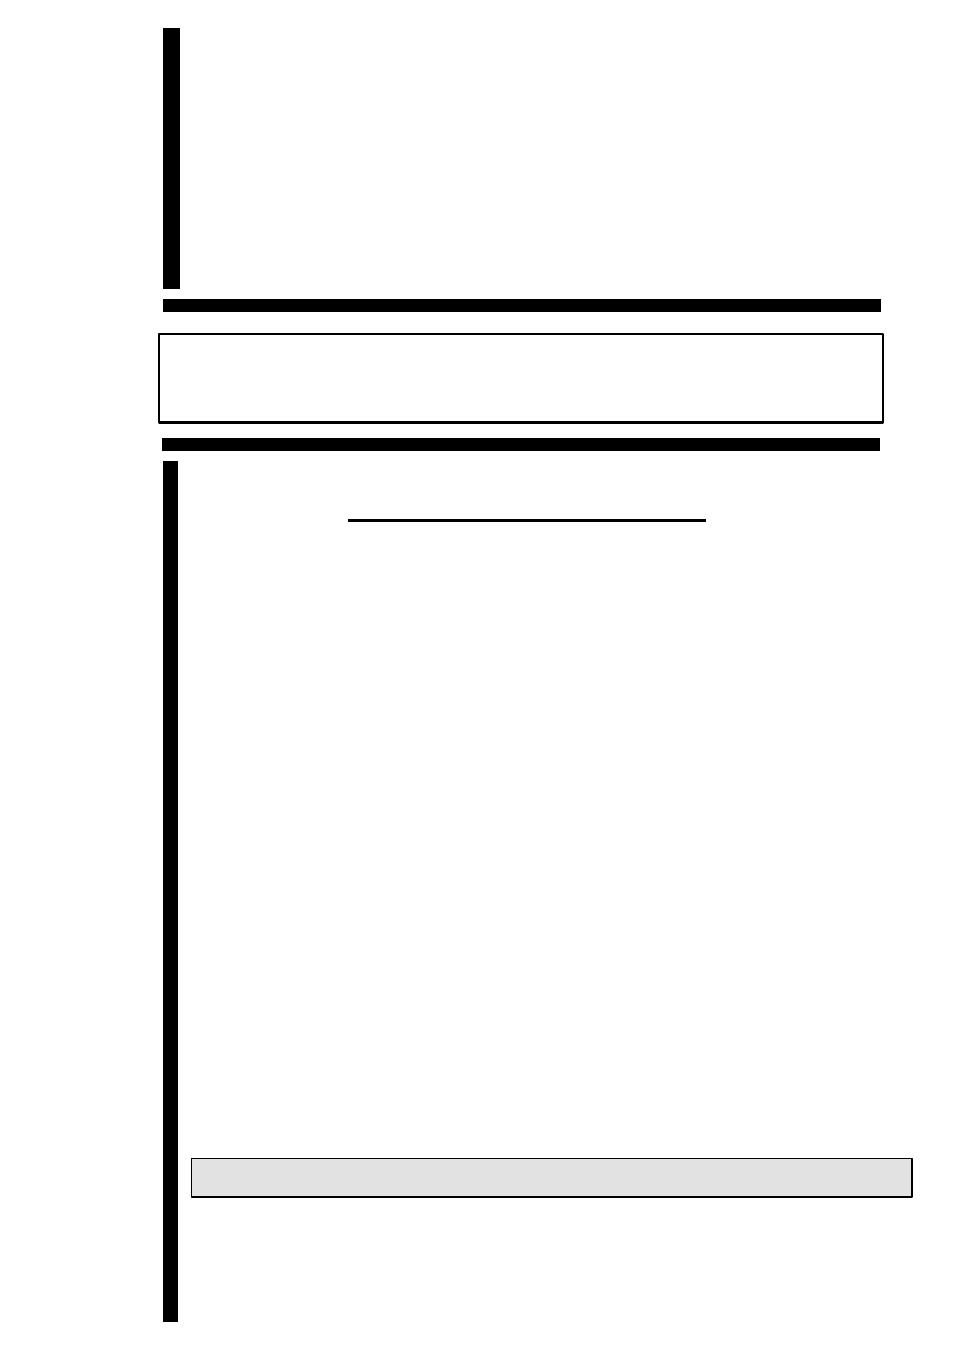 hitachi technical manual